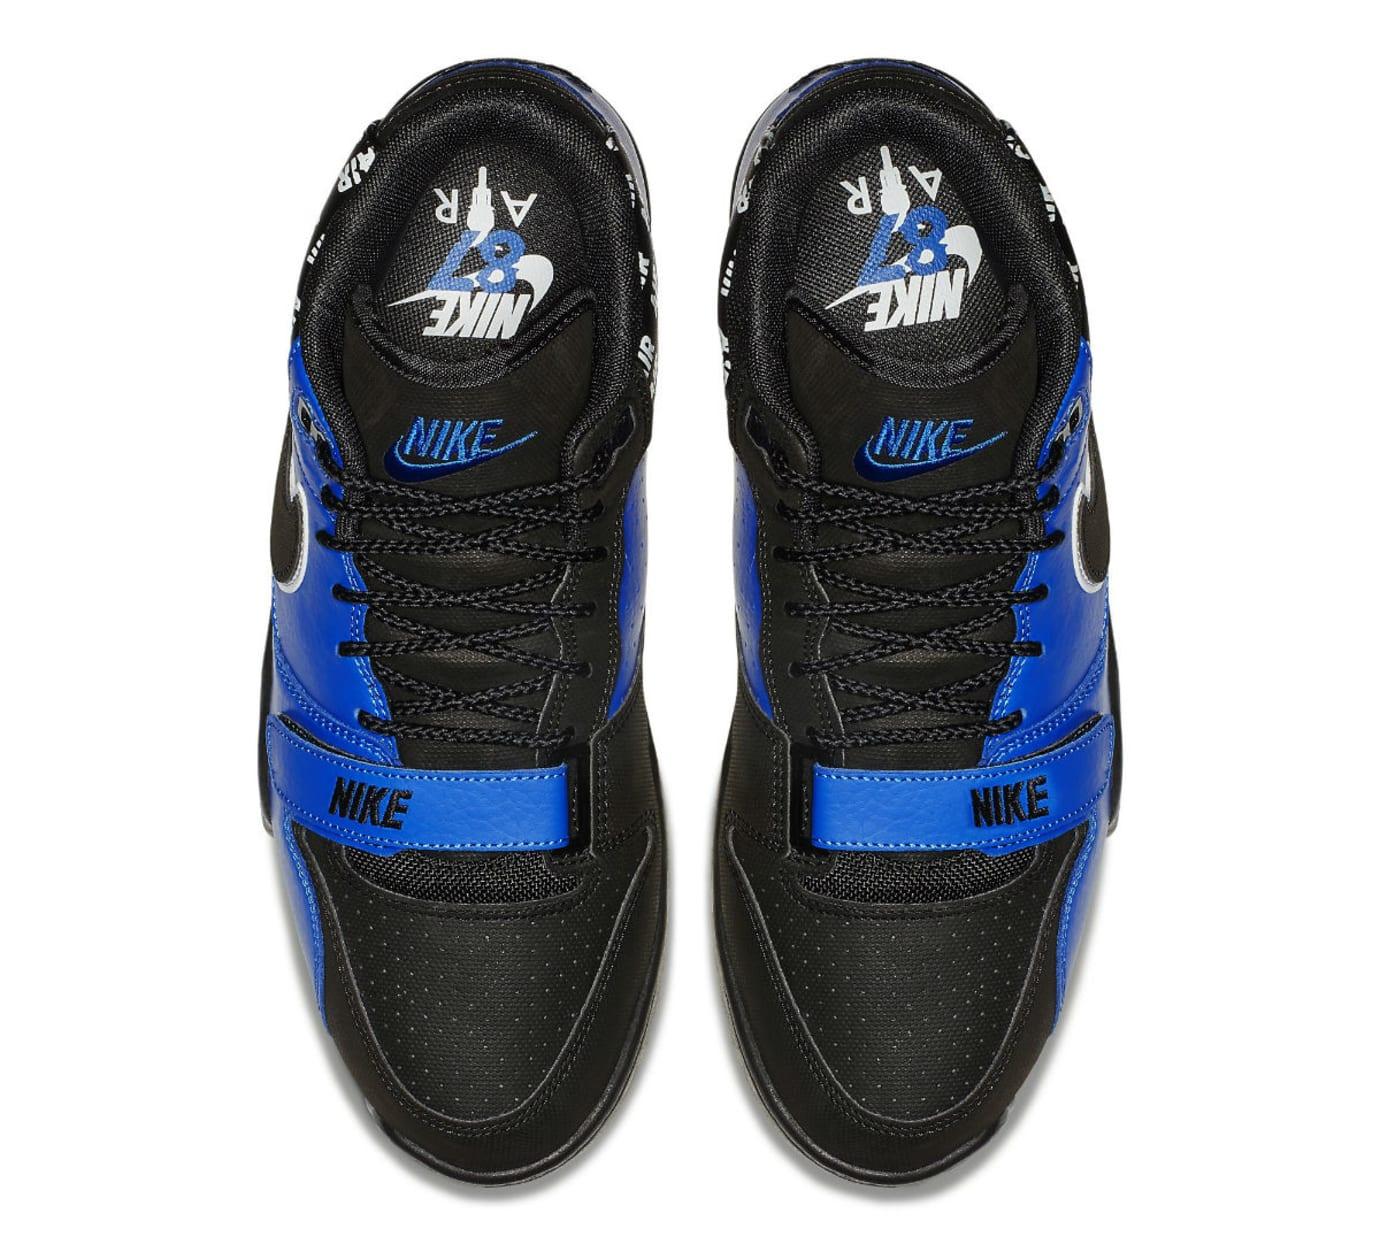 Nike Air Trainer 1 SOA Hyper Cobalt Release Date AQ5099-400 Top